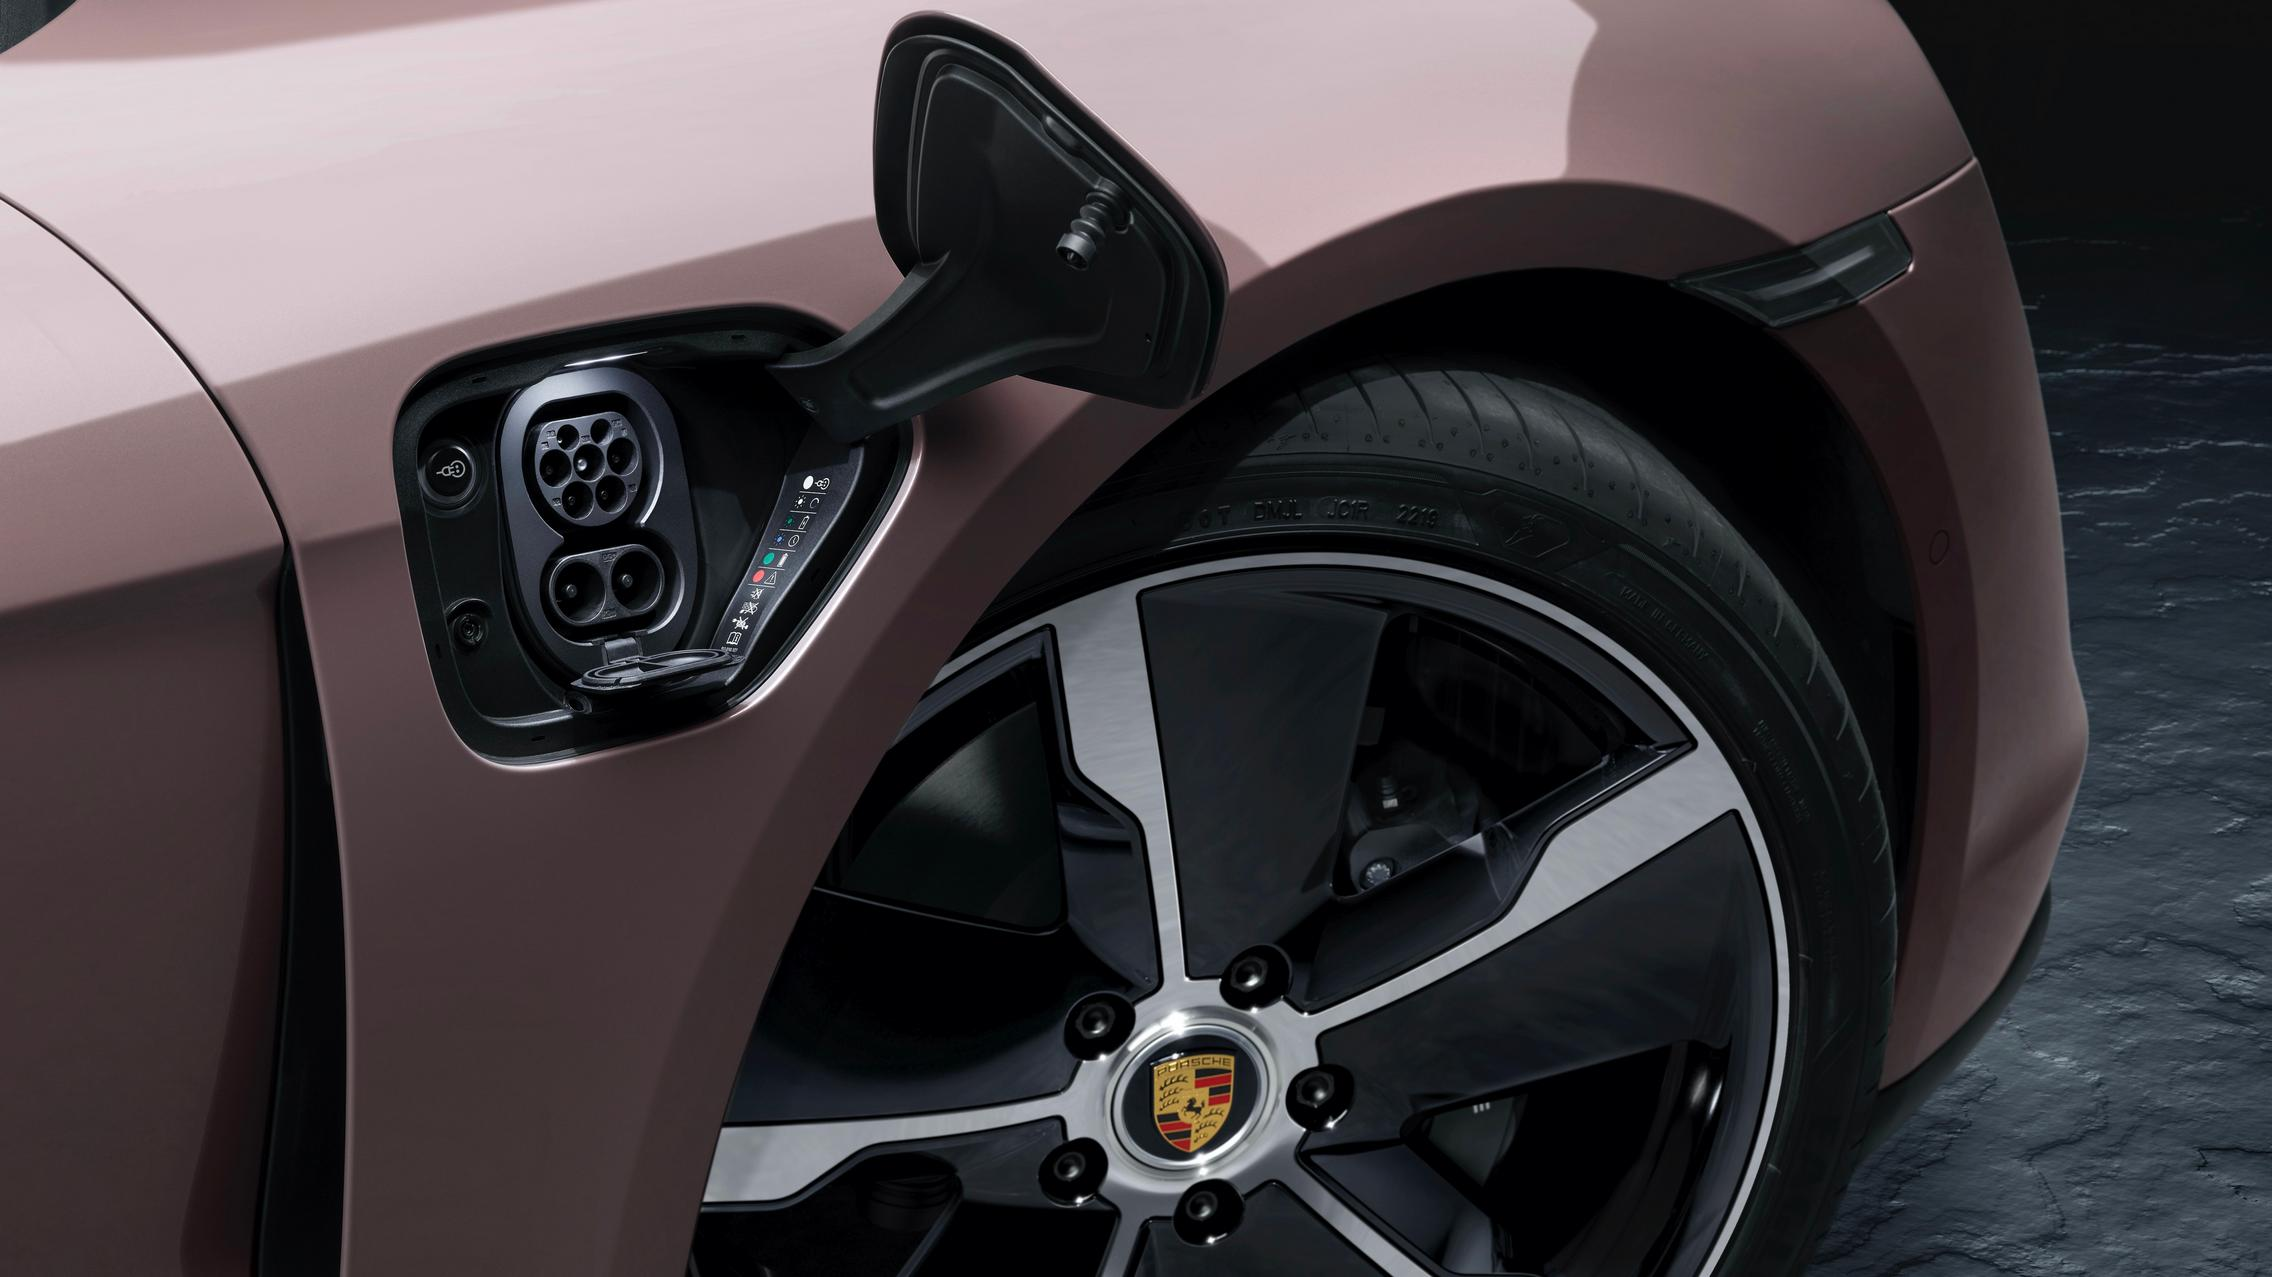 Porsche Taycan RWD charging port